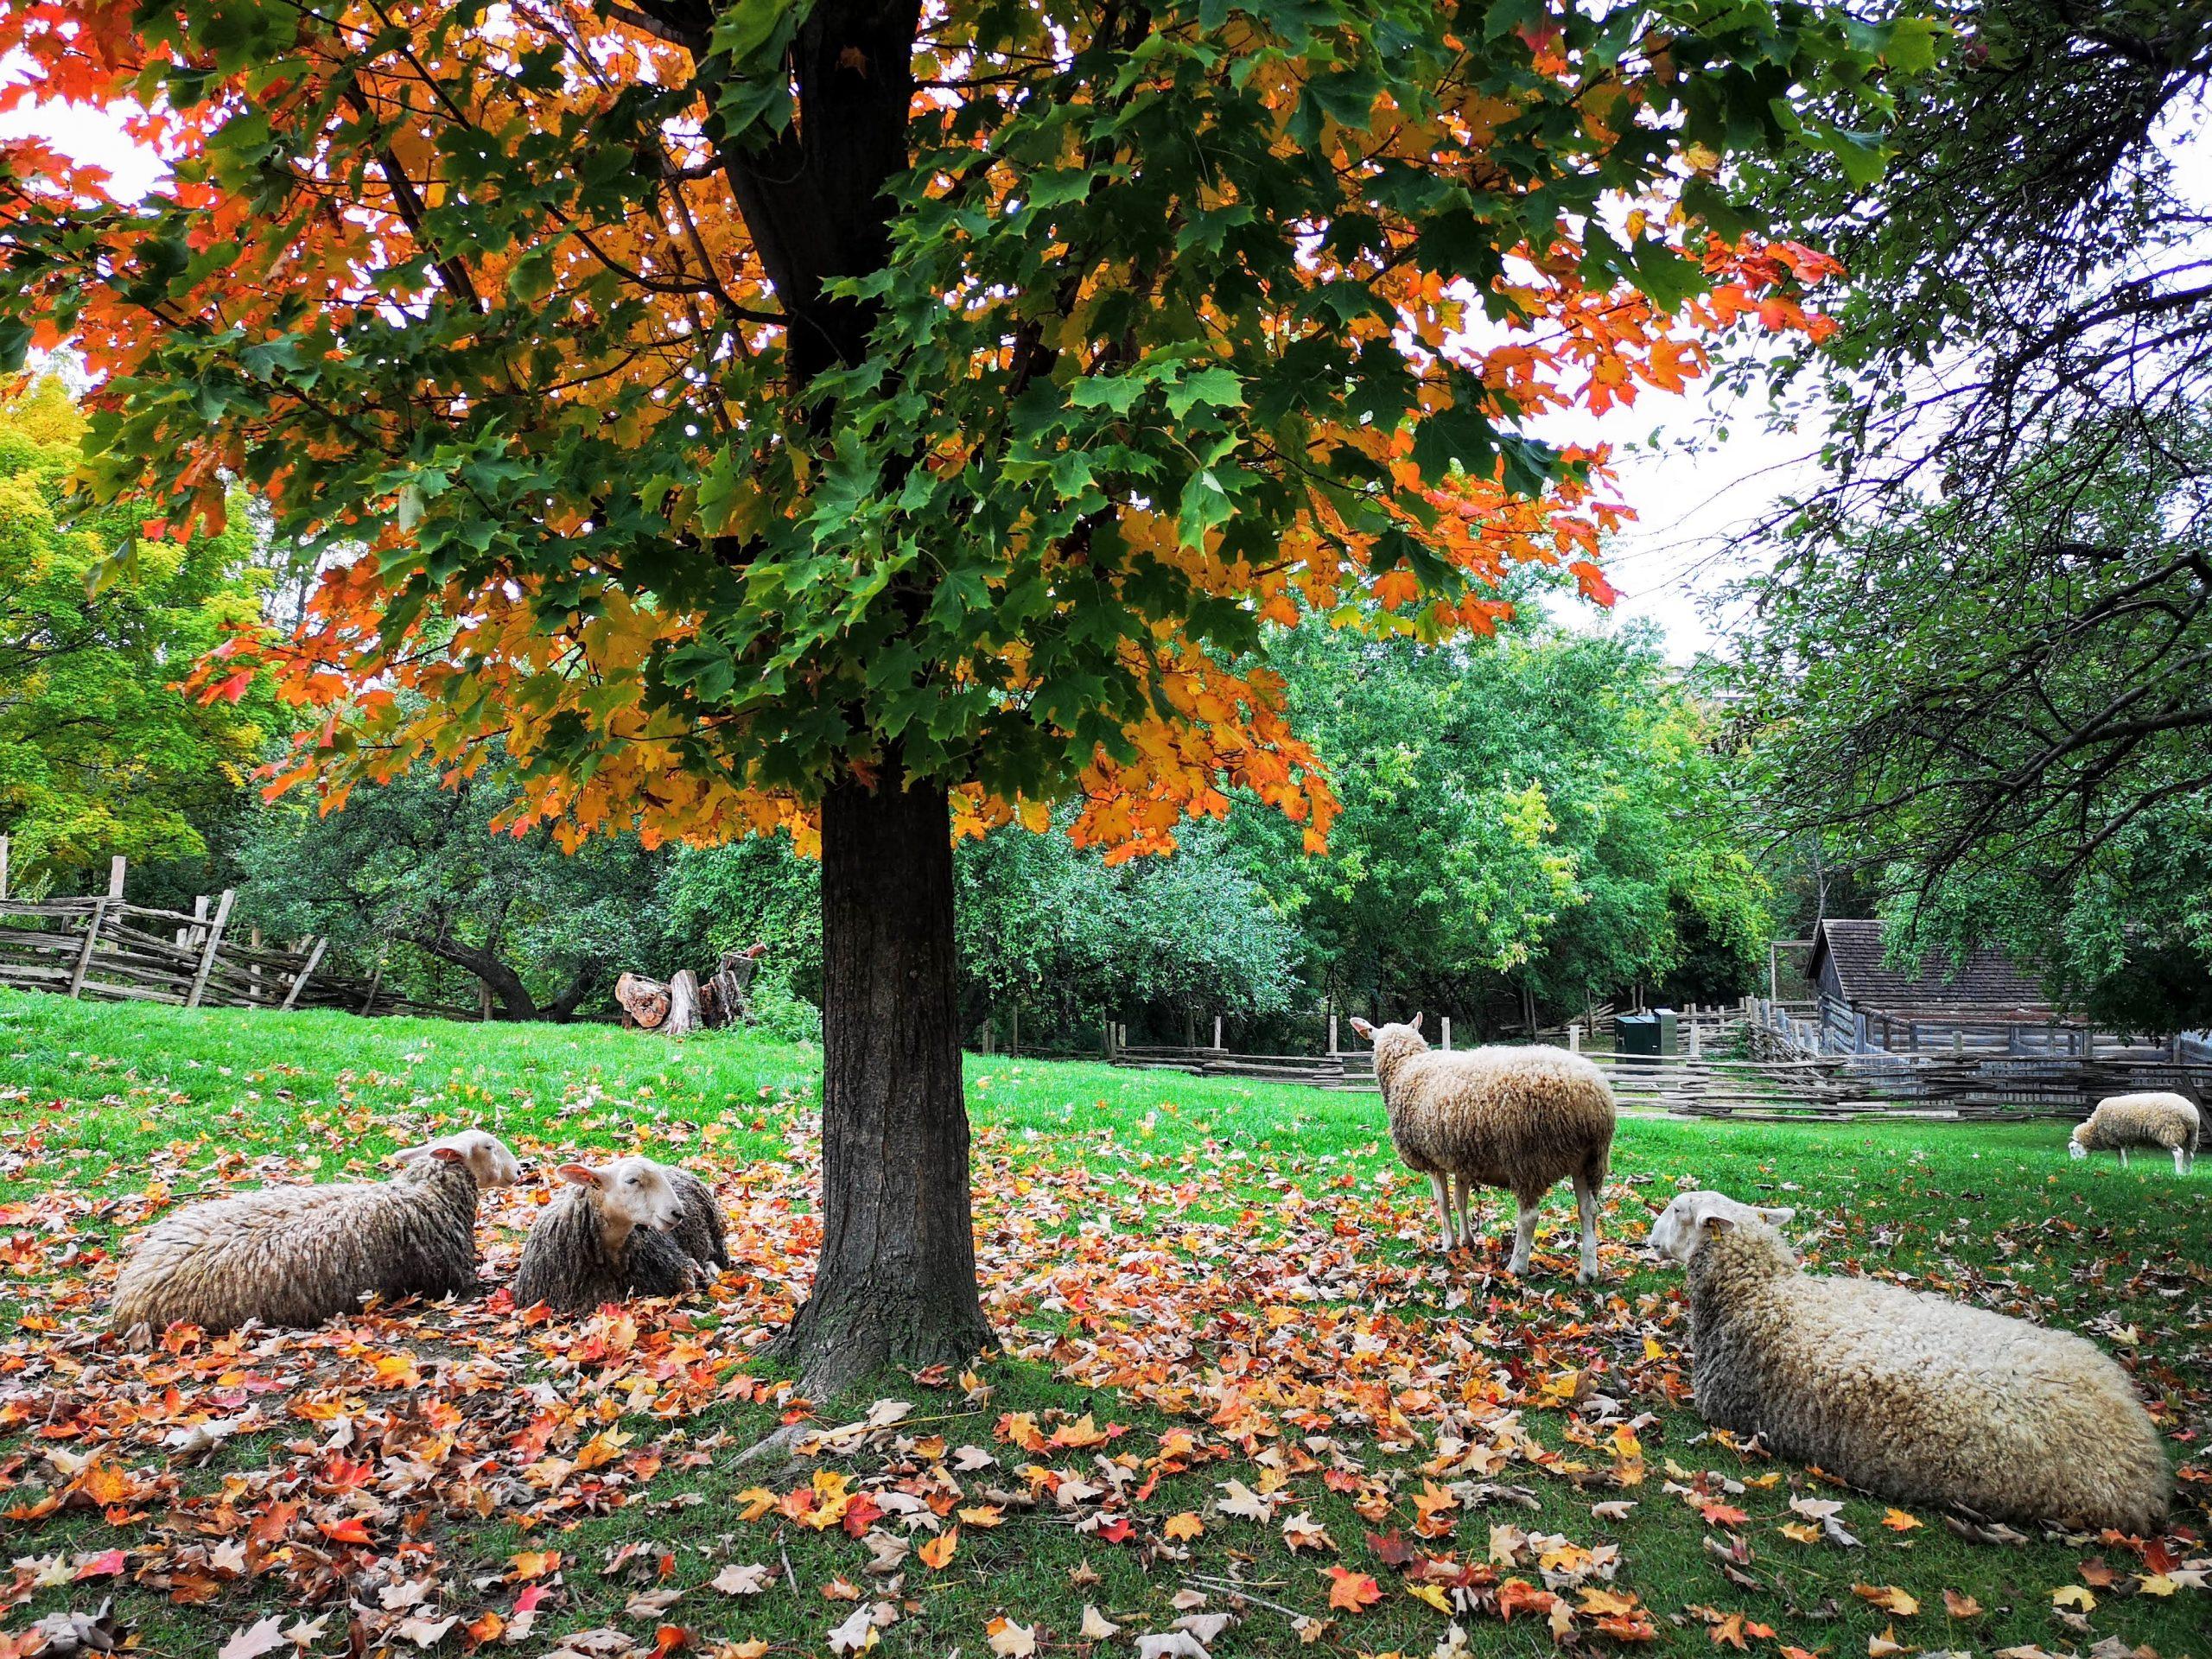 Sheep during autumn